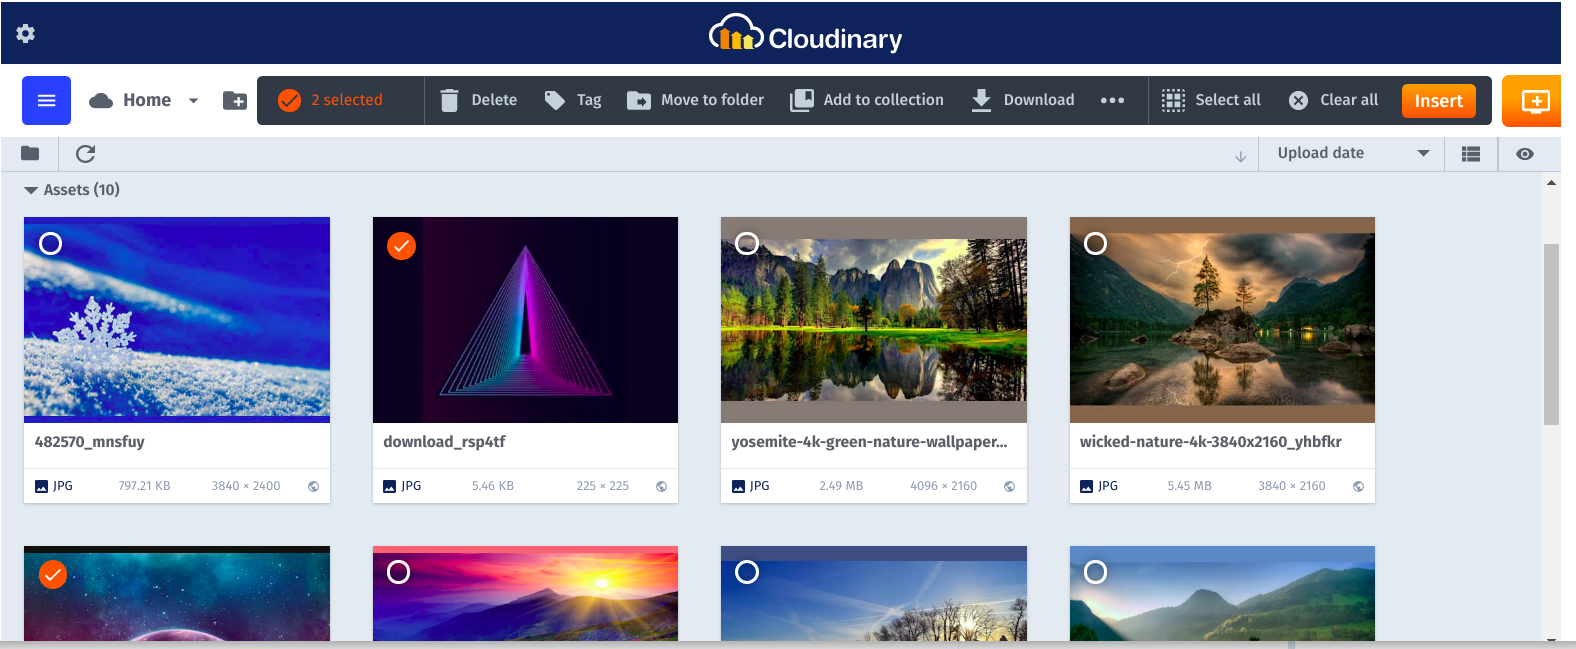 Cloudinary Modal.png